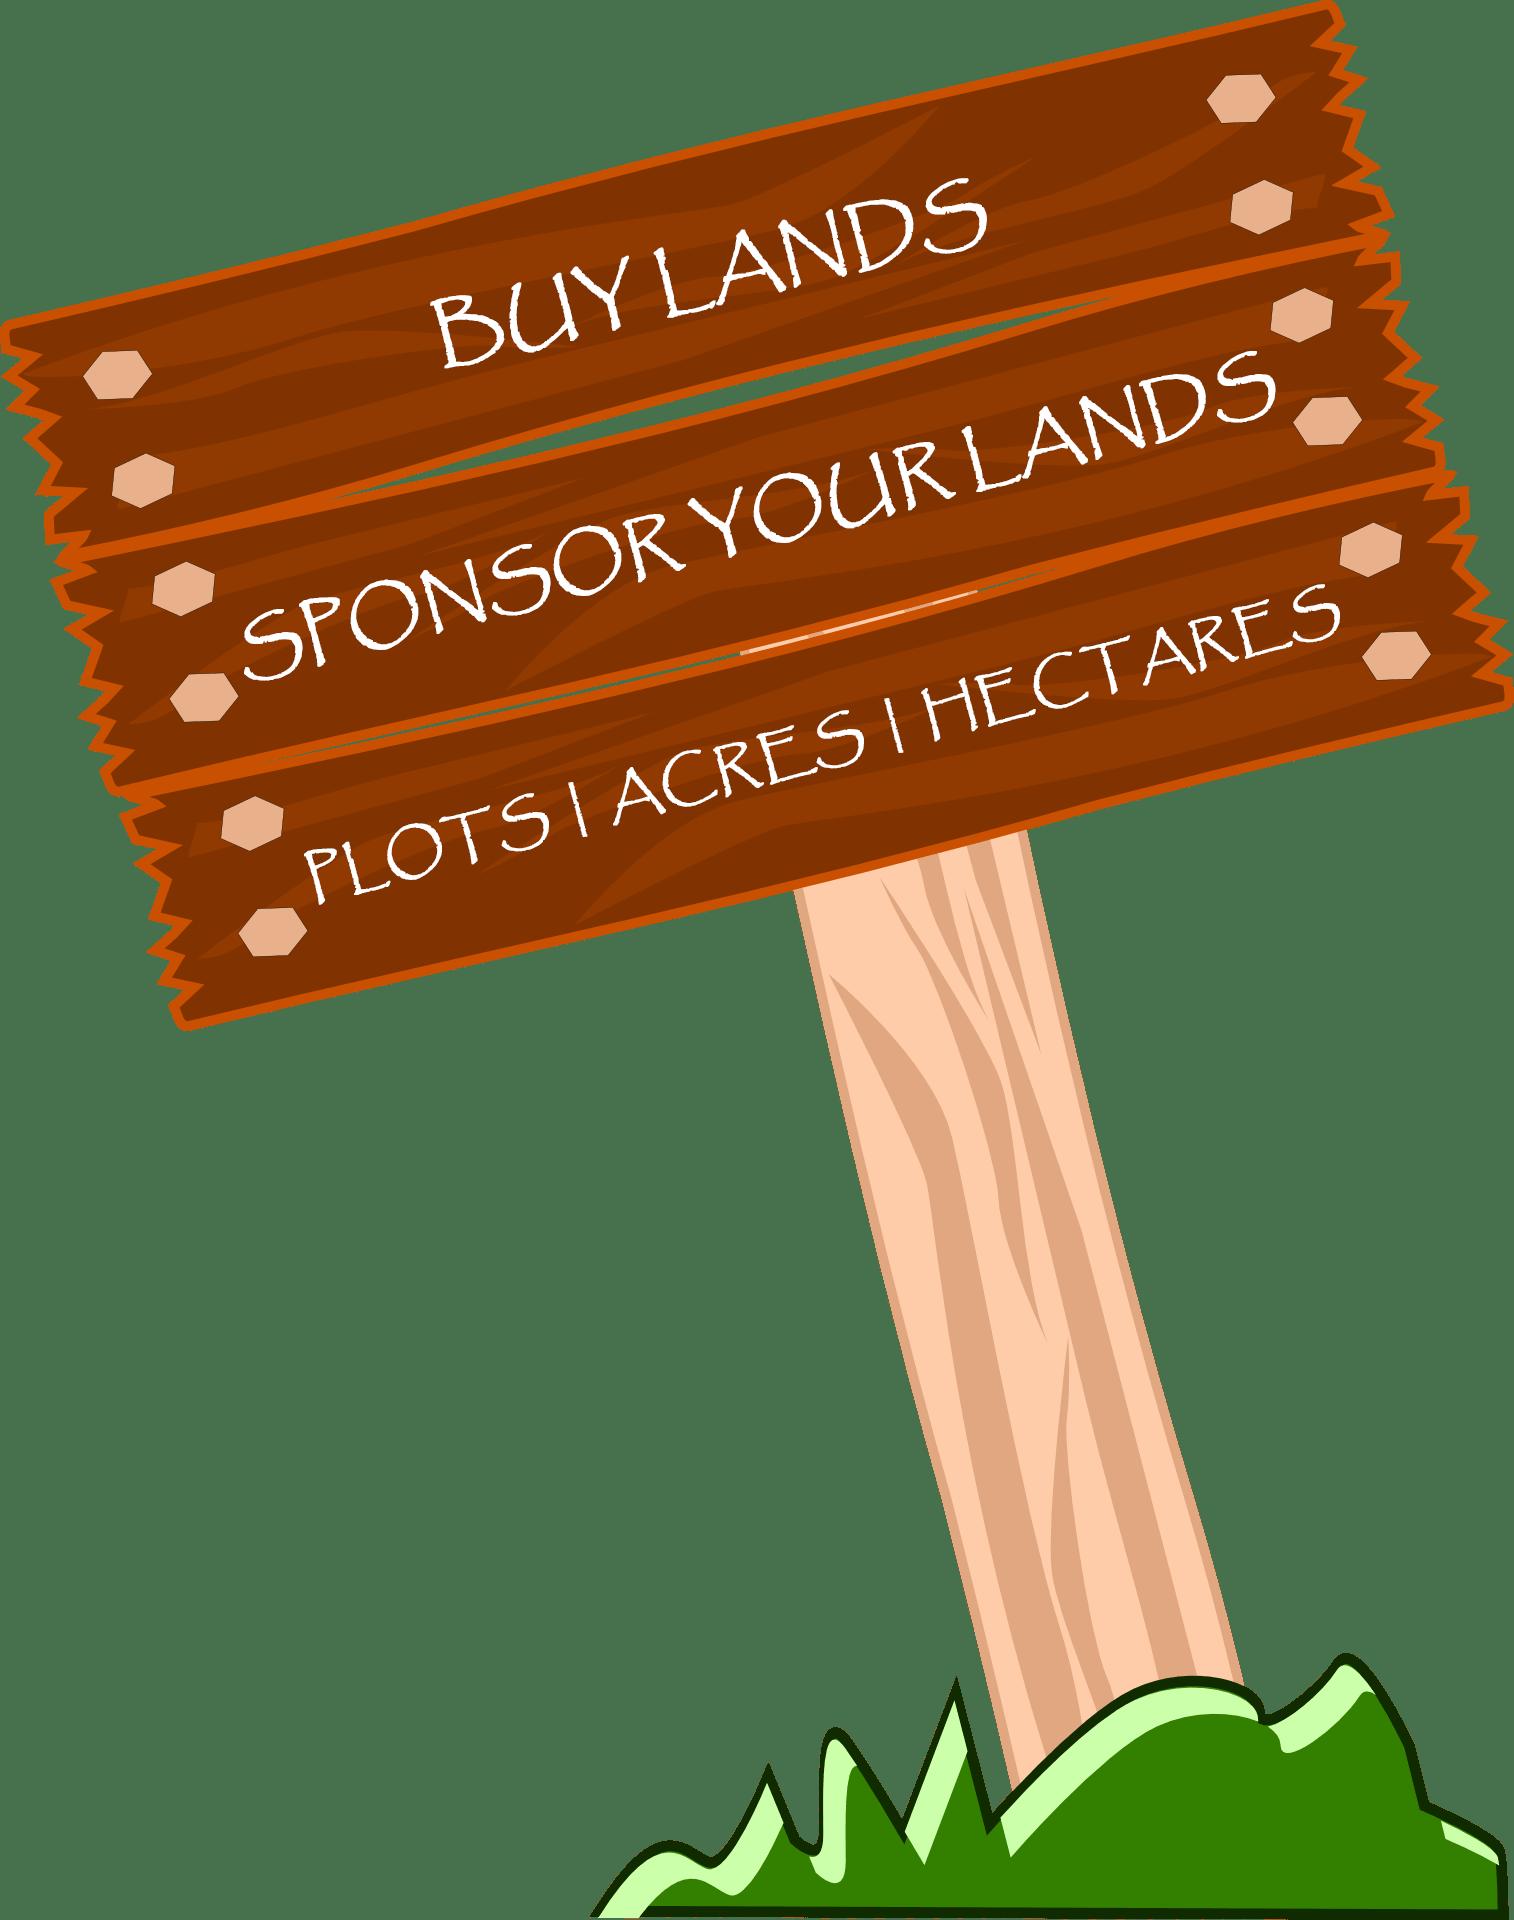 Land clipart plot land. Skyler hank sponsorship sale